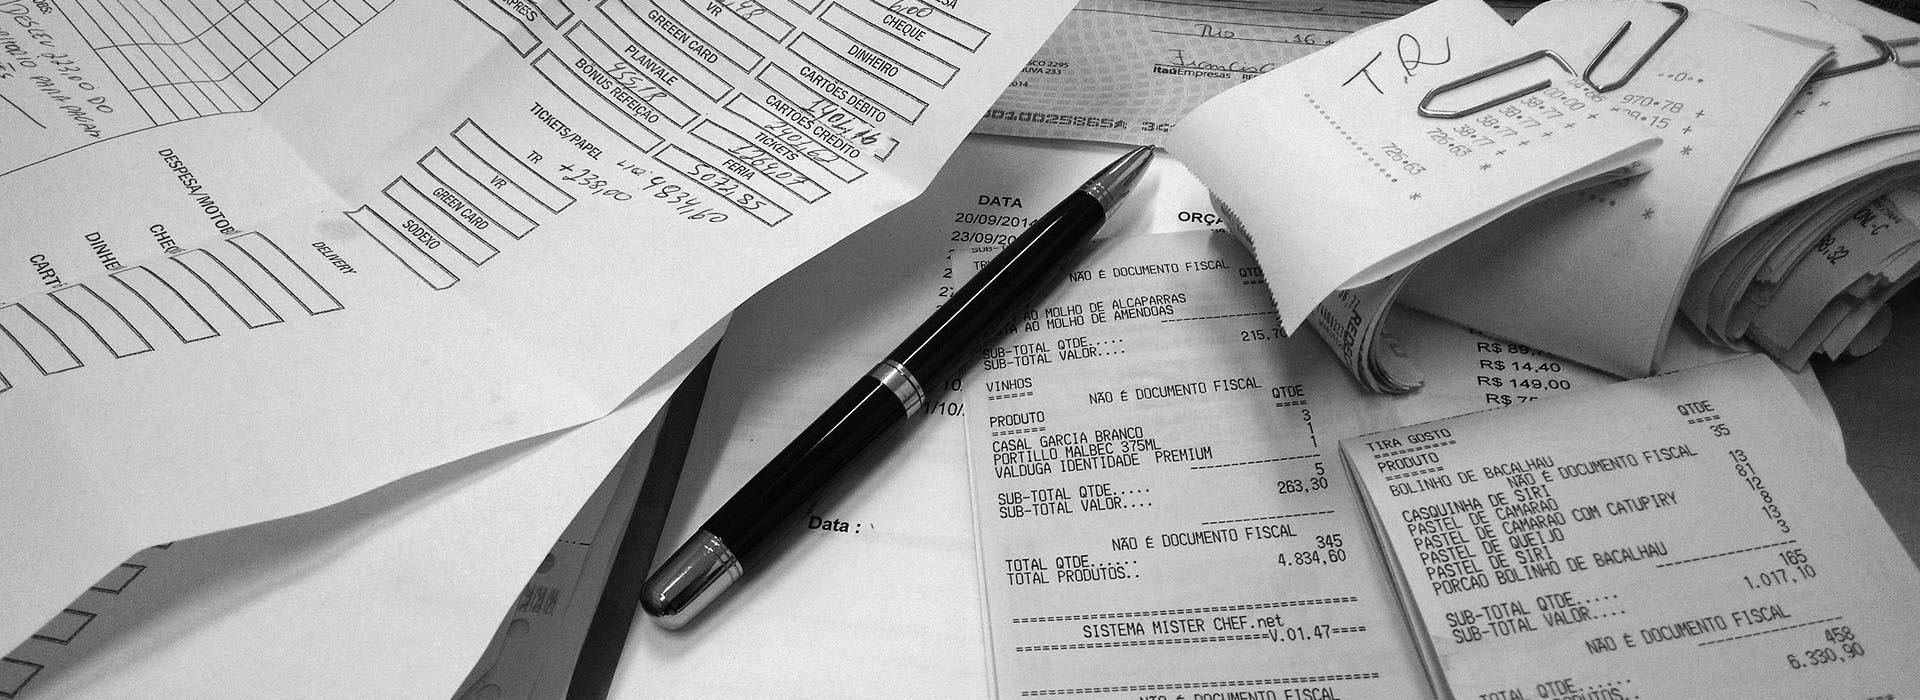 Área fiscal contable